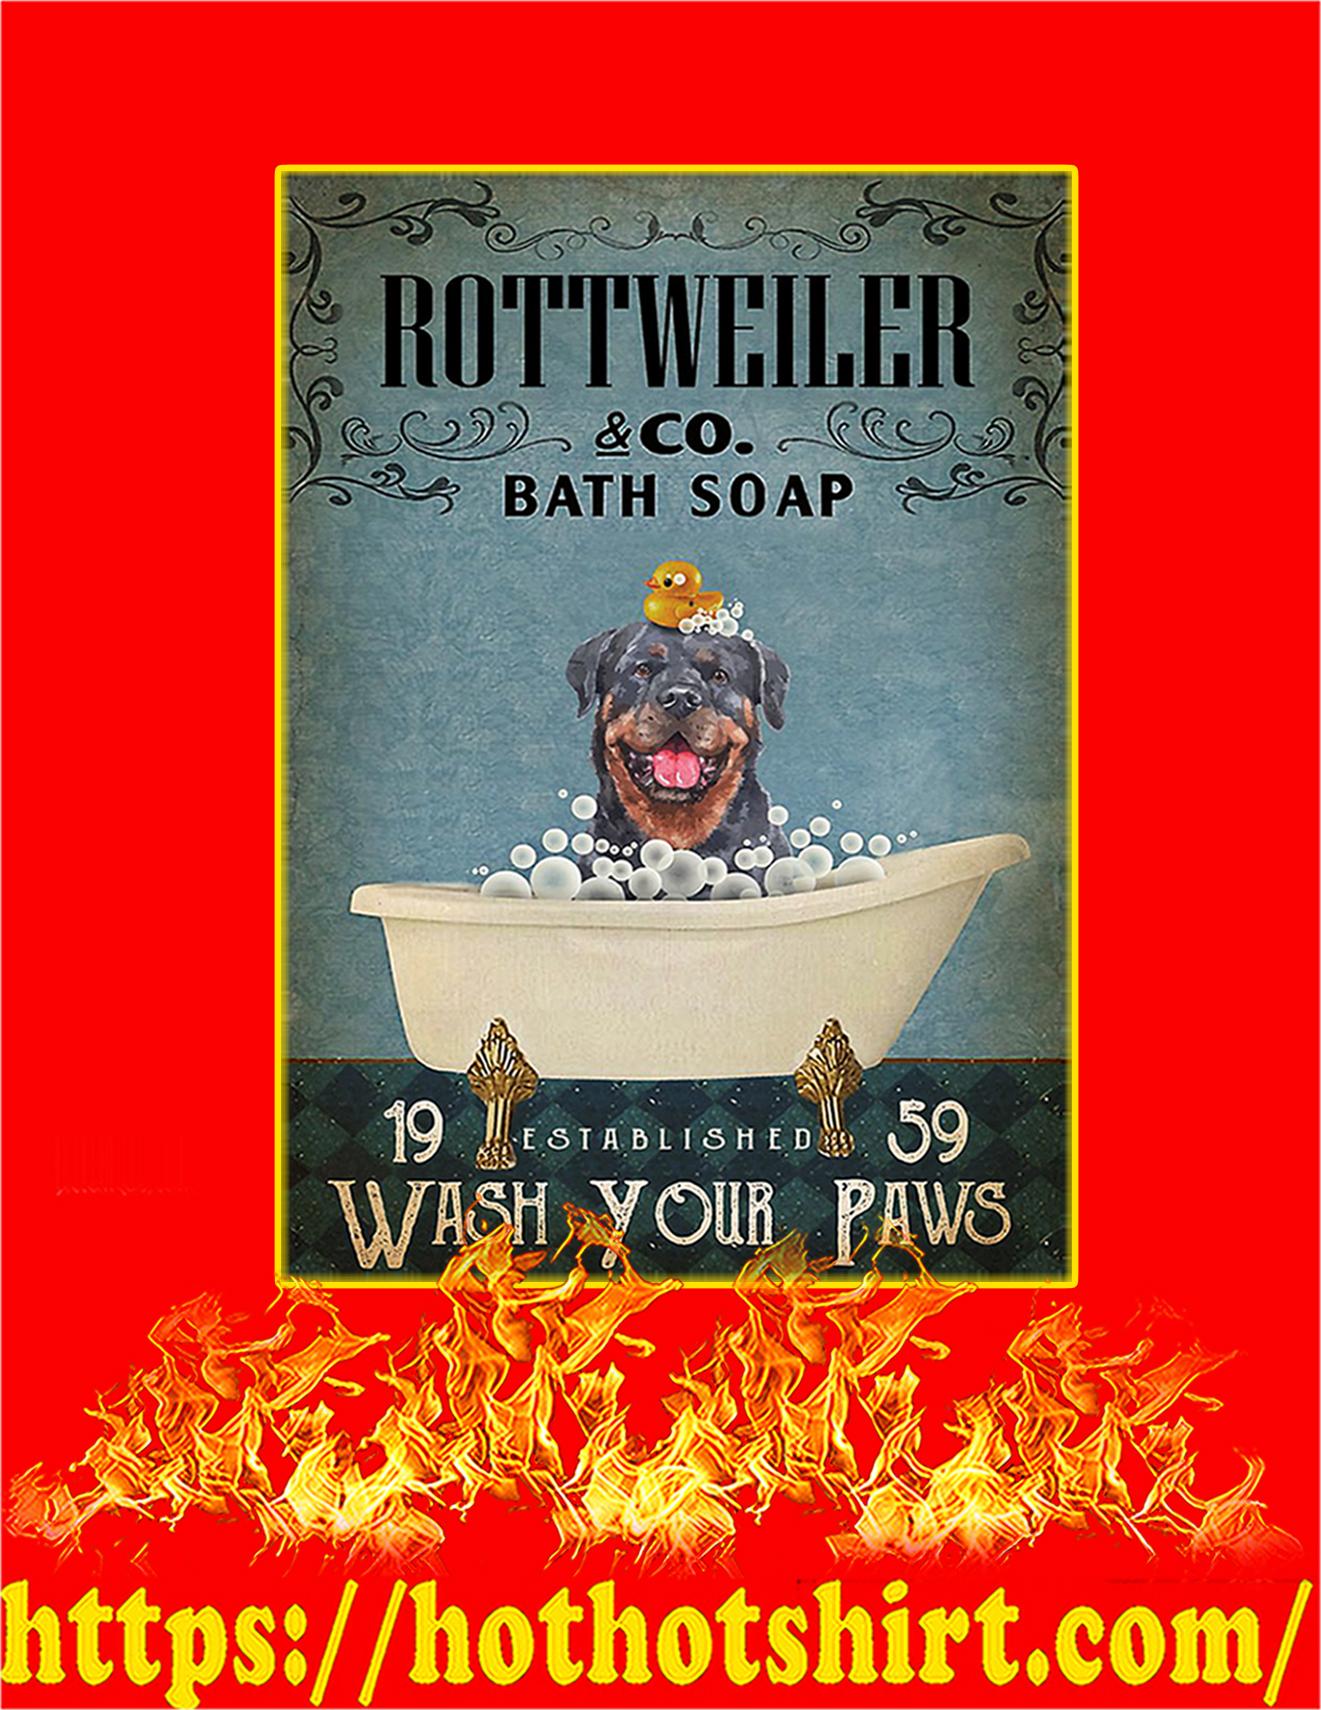 Bath soap company rottweiler poster - A4